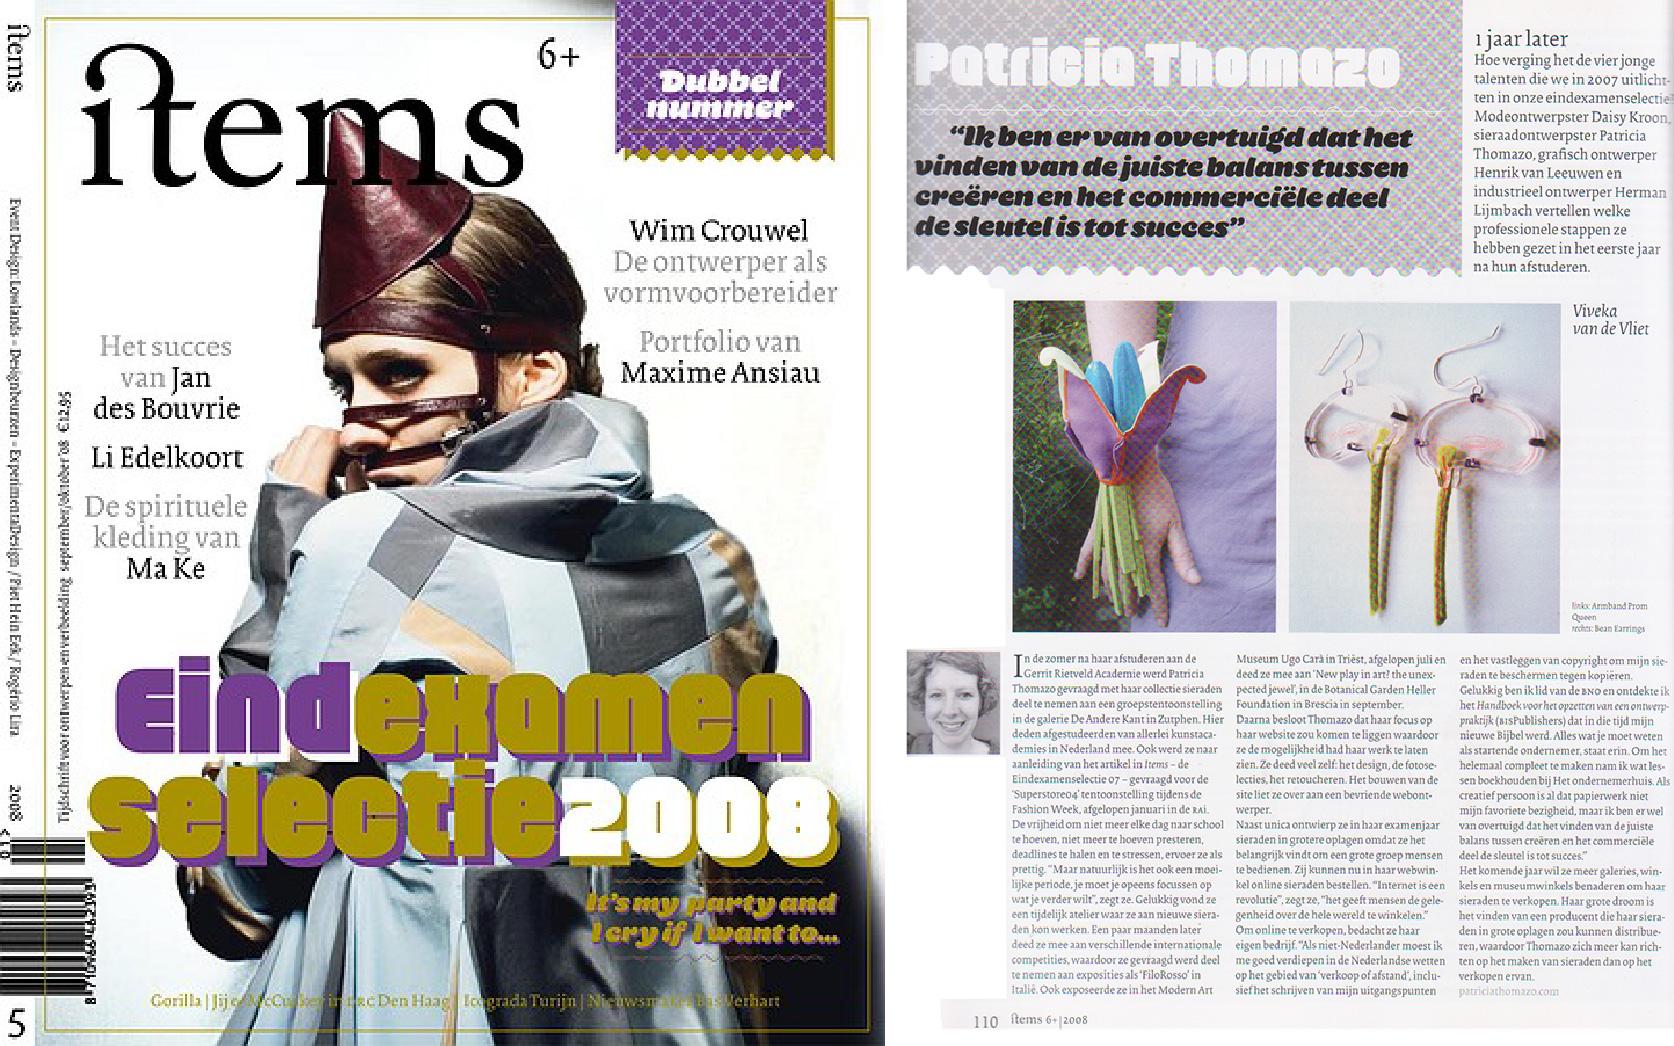 items magazine, follow up interview of Patricia Thomazo's jewellery work